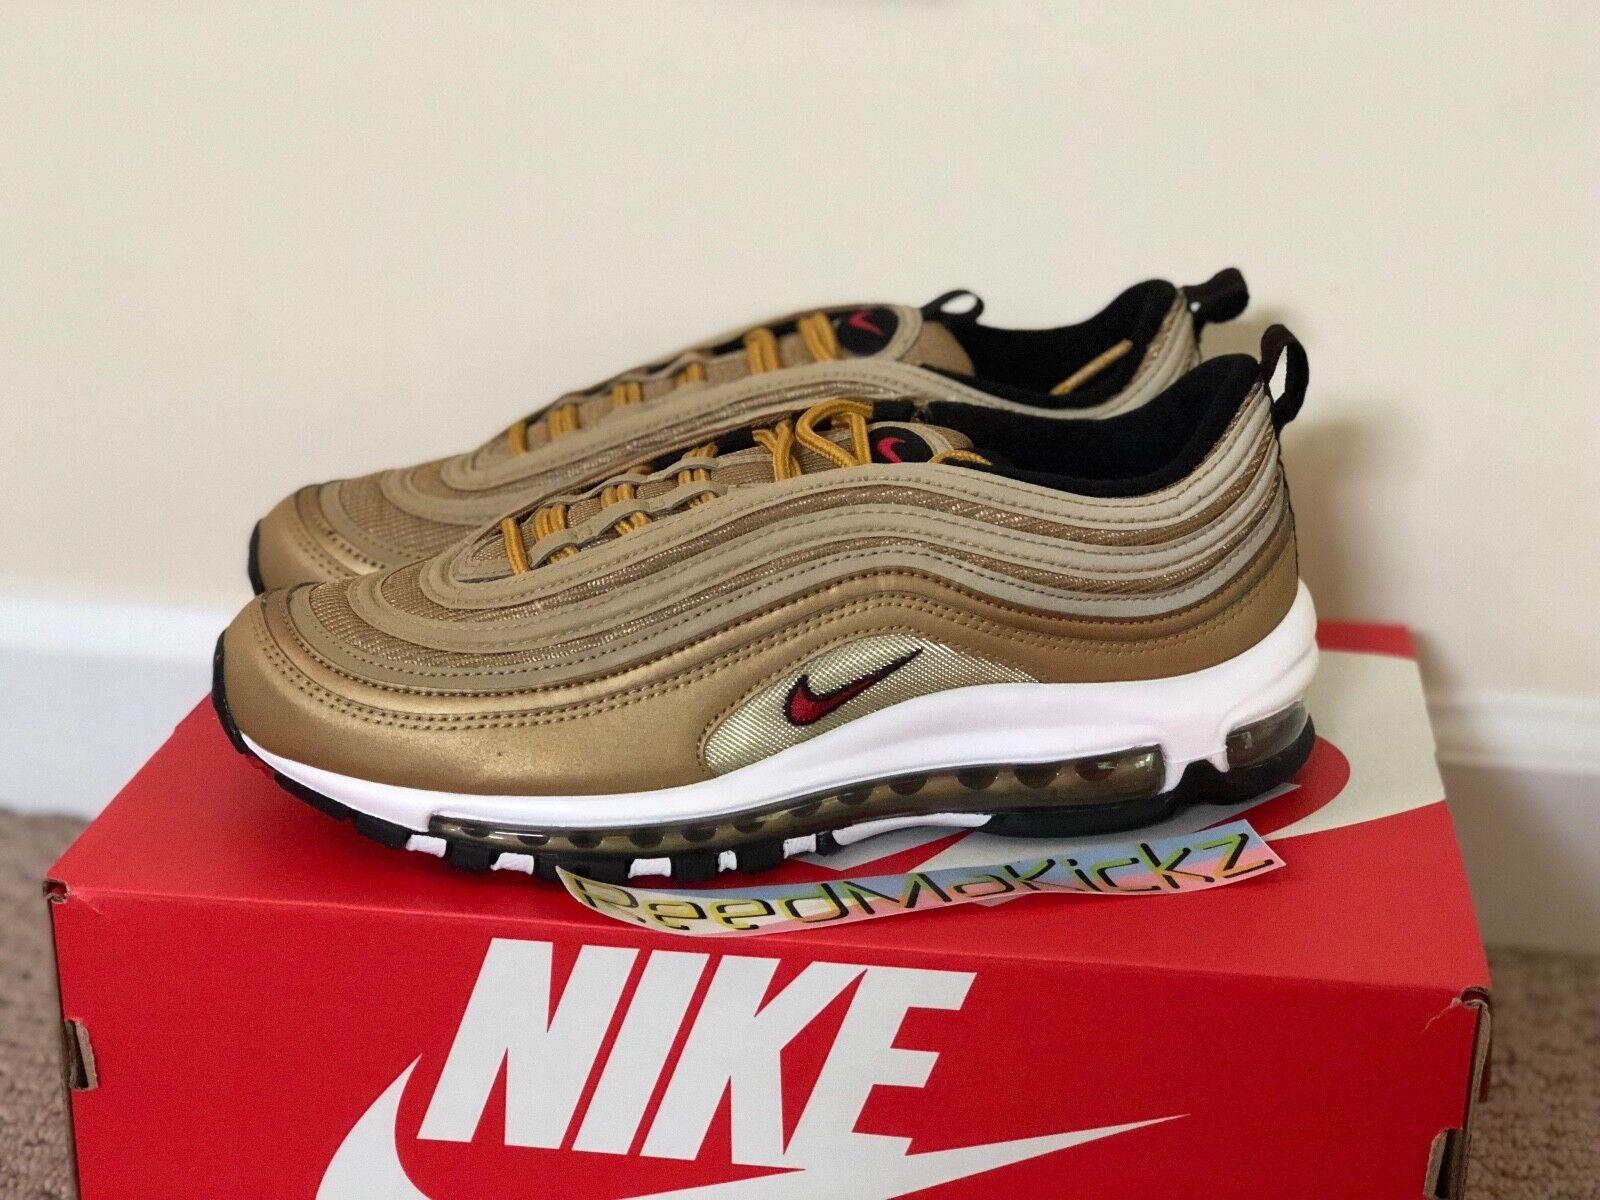 Nike Air Max 97 OG QS Metallic Gold womens sizes 885691 700